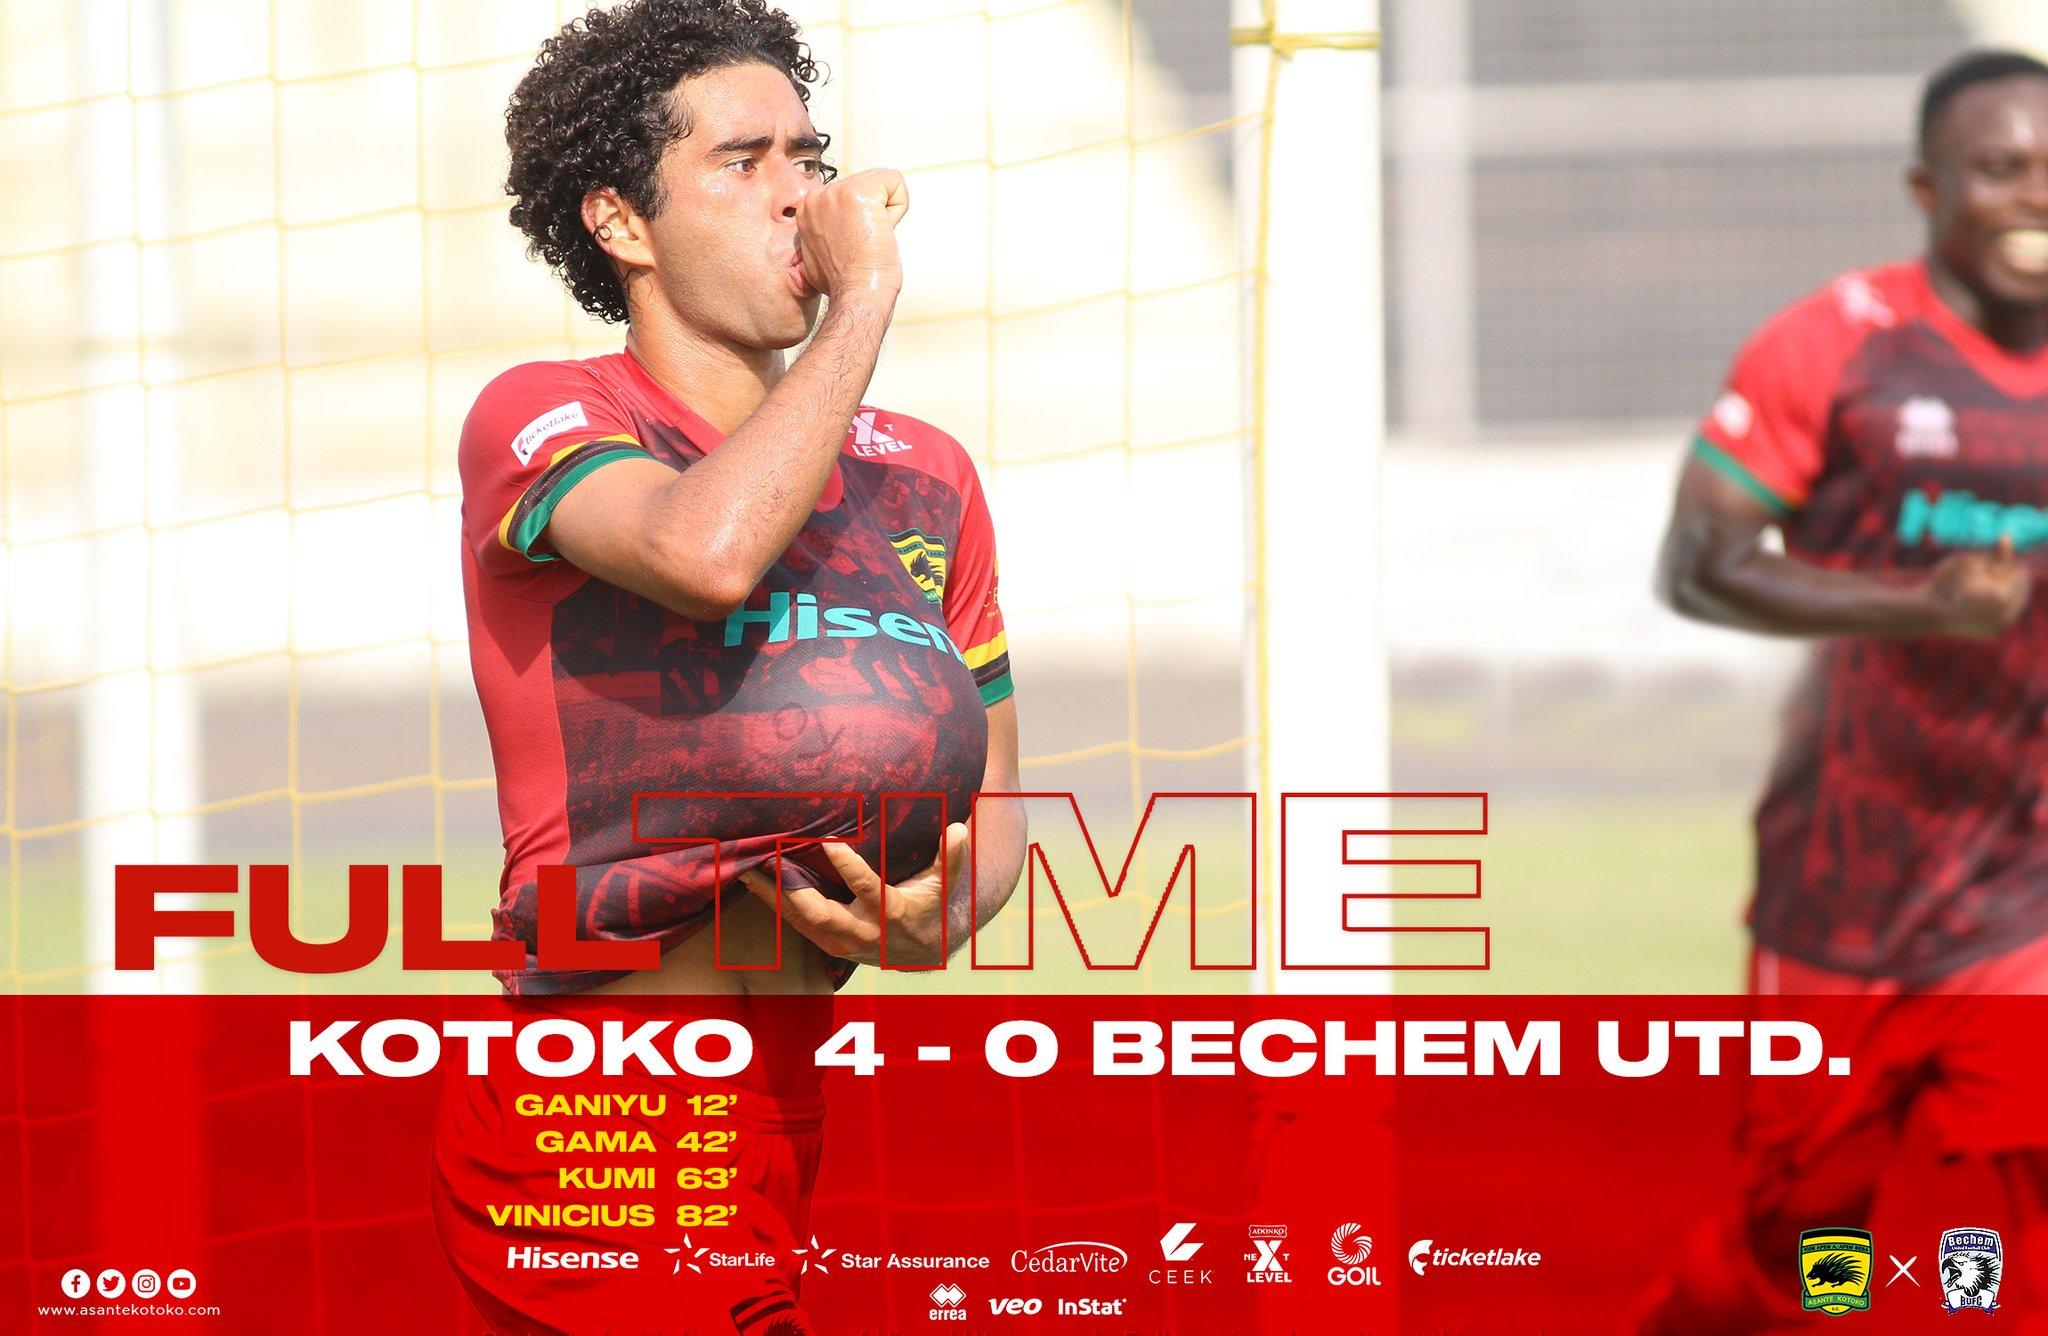 20/21 Ghana Premier League: Kotoko moves to third after big win against Bechem Utd